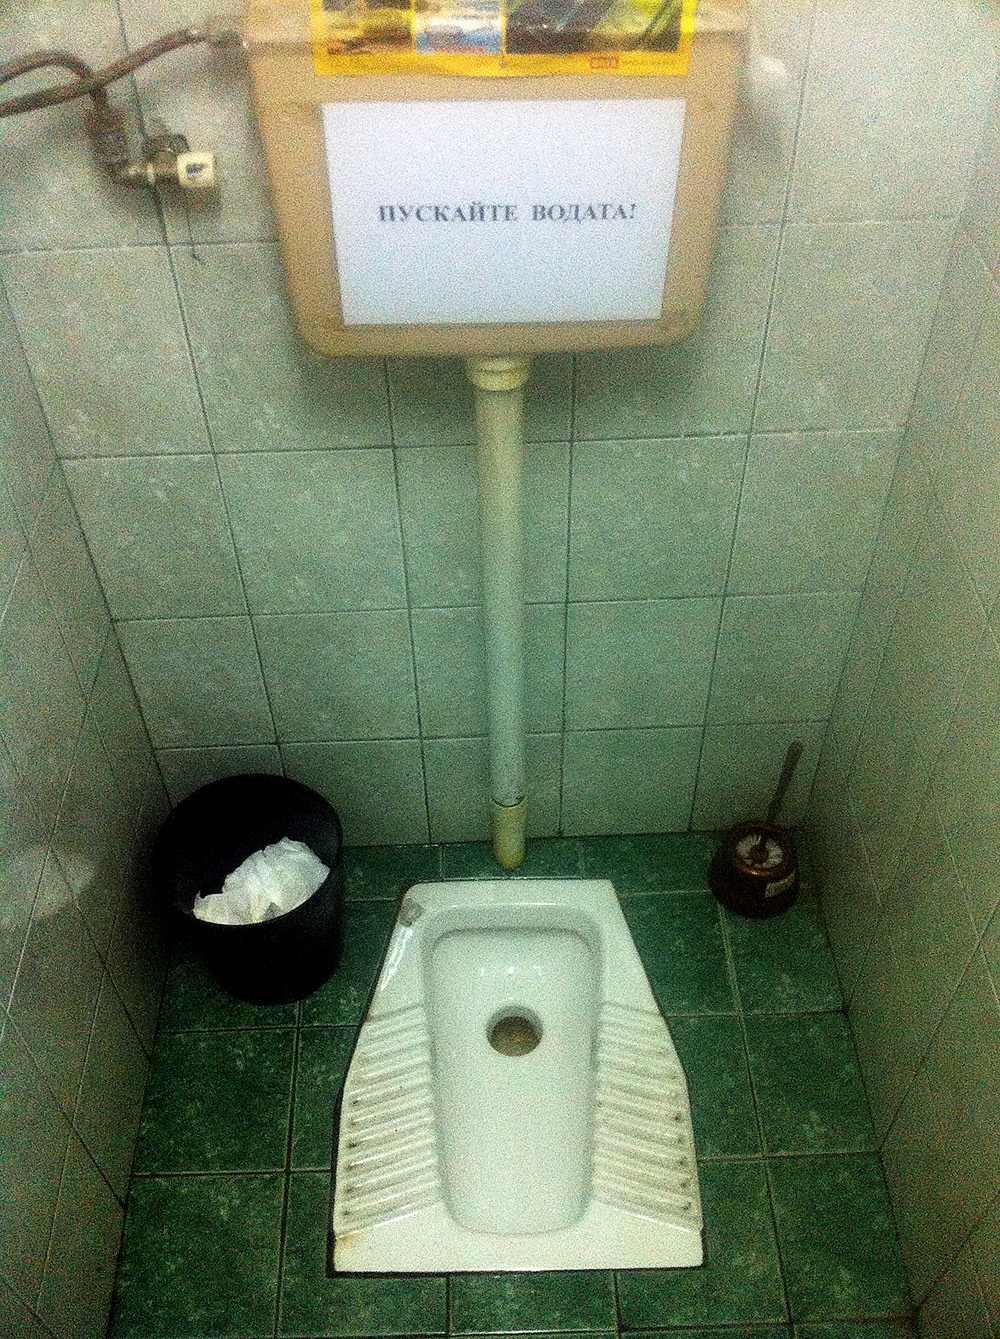 A flush squat toilet in Sofia, Bulgaria